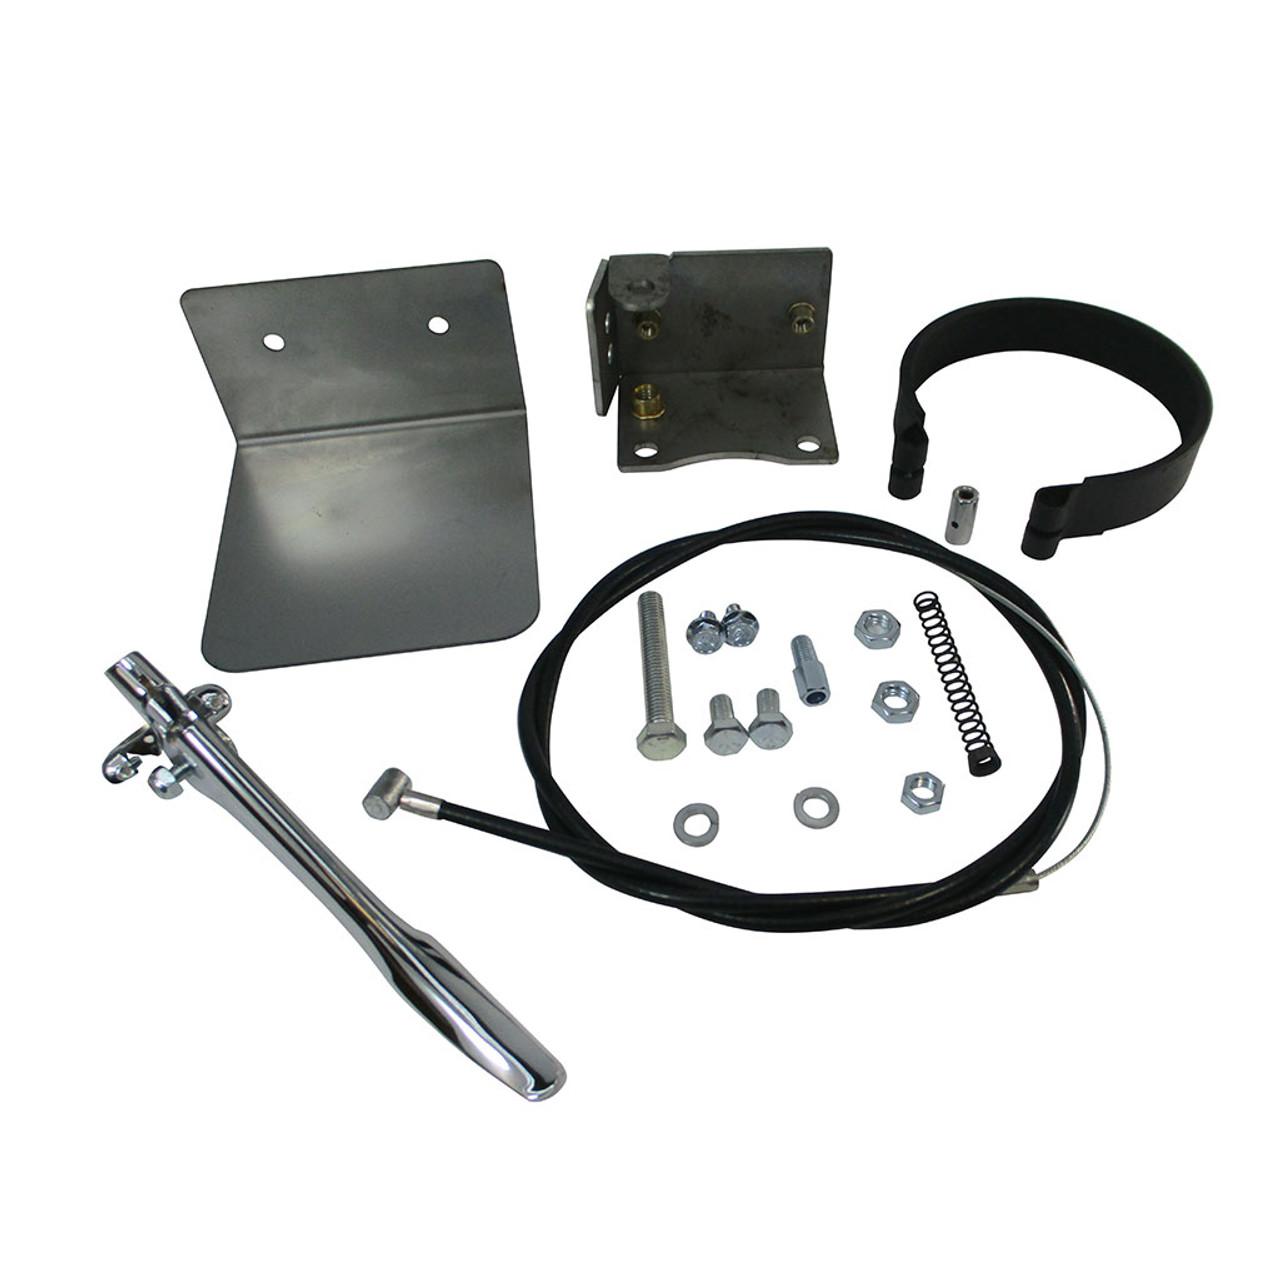 "Centrifugal Clutch Band Brake and 1"" Brake Lever Kit"